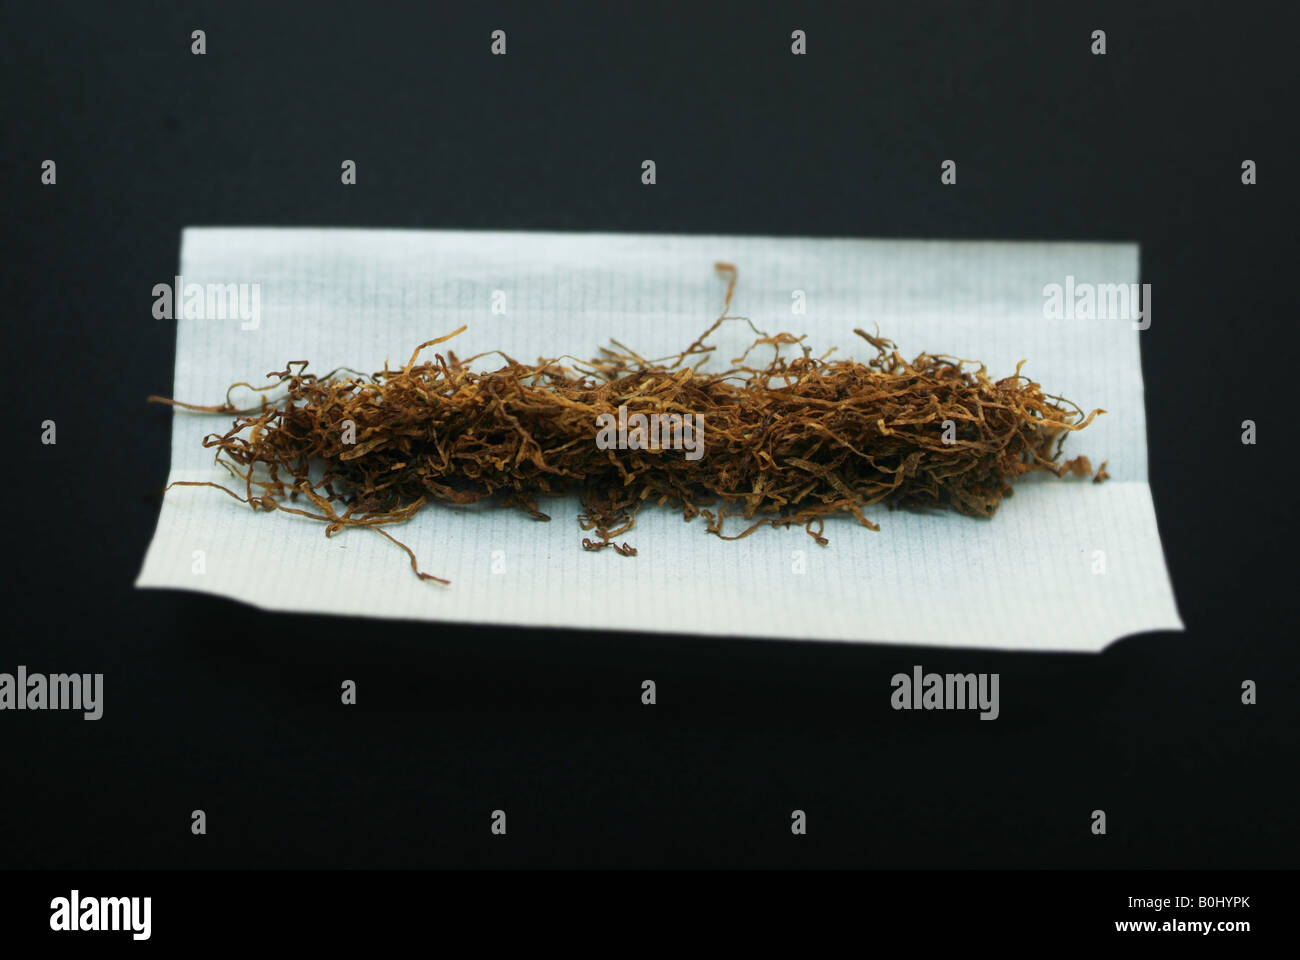 Essay on smoking cigarettes